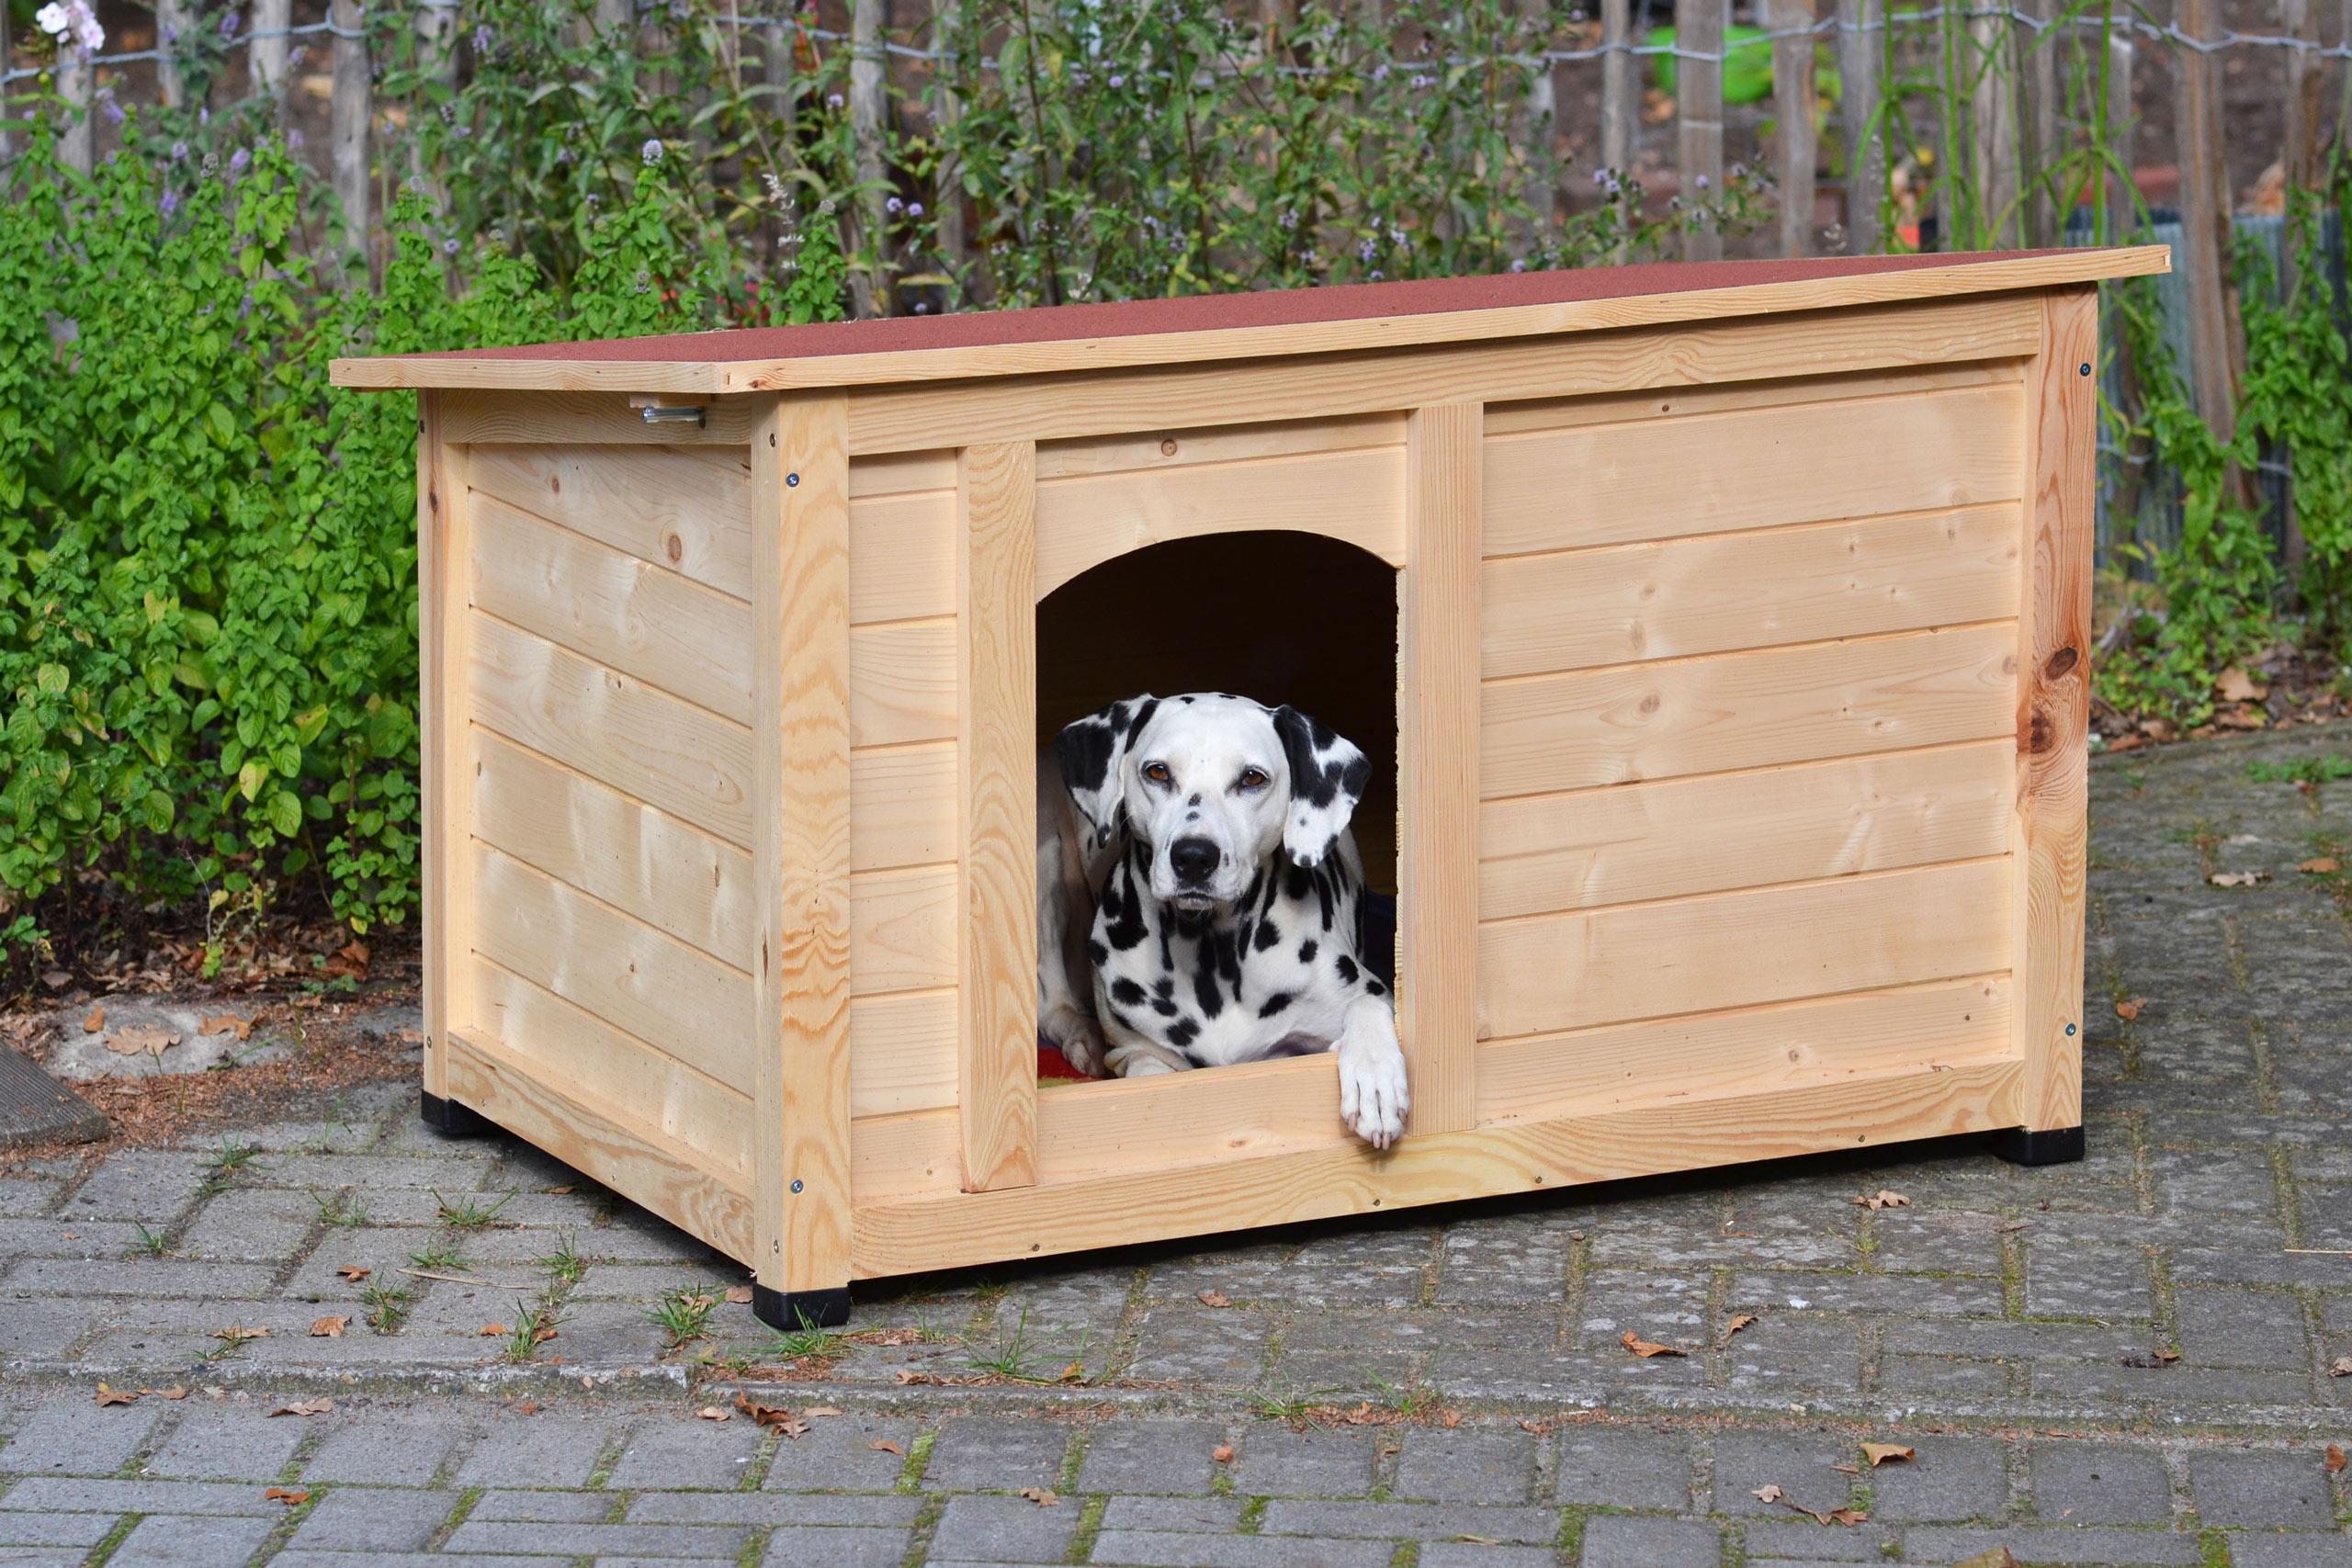 dobar 55014fsc hundeh tte lord xl outdoor hundehaus f r gro e hunde platz f r hundebett. Black Bedroom Furniture Sets. Home Design Ideas